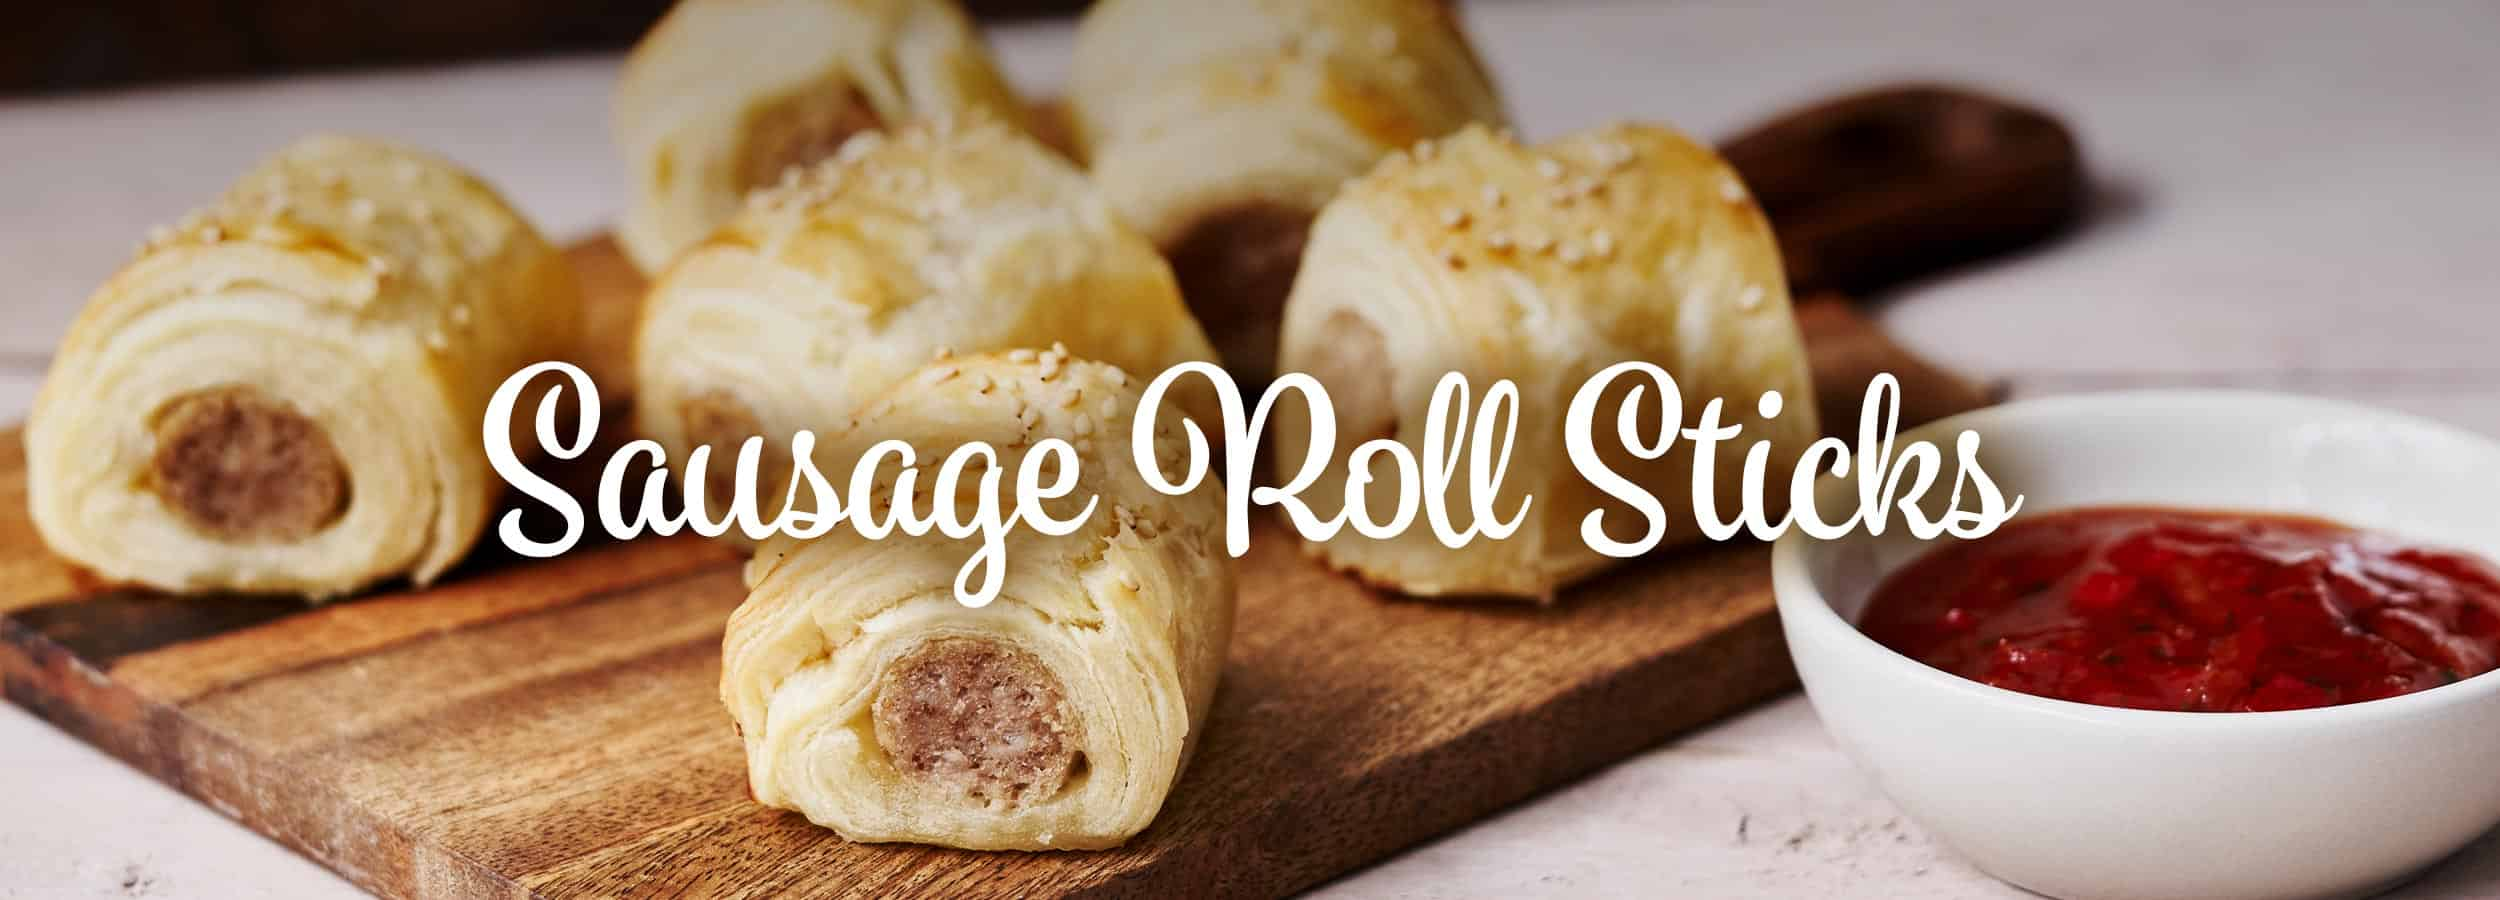 Sausage Rolls Sticks